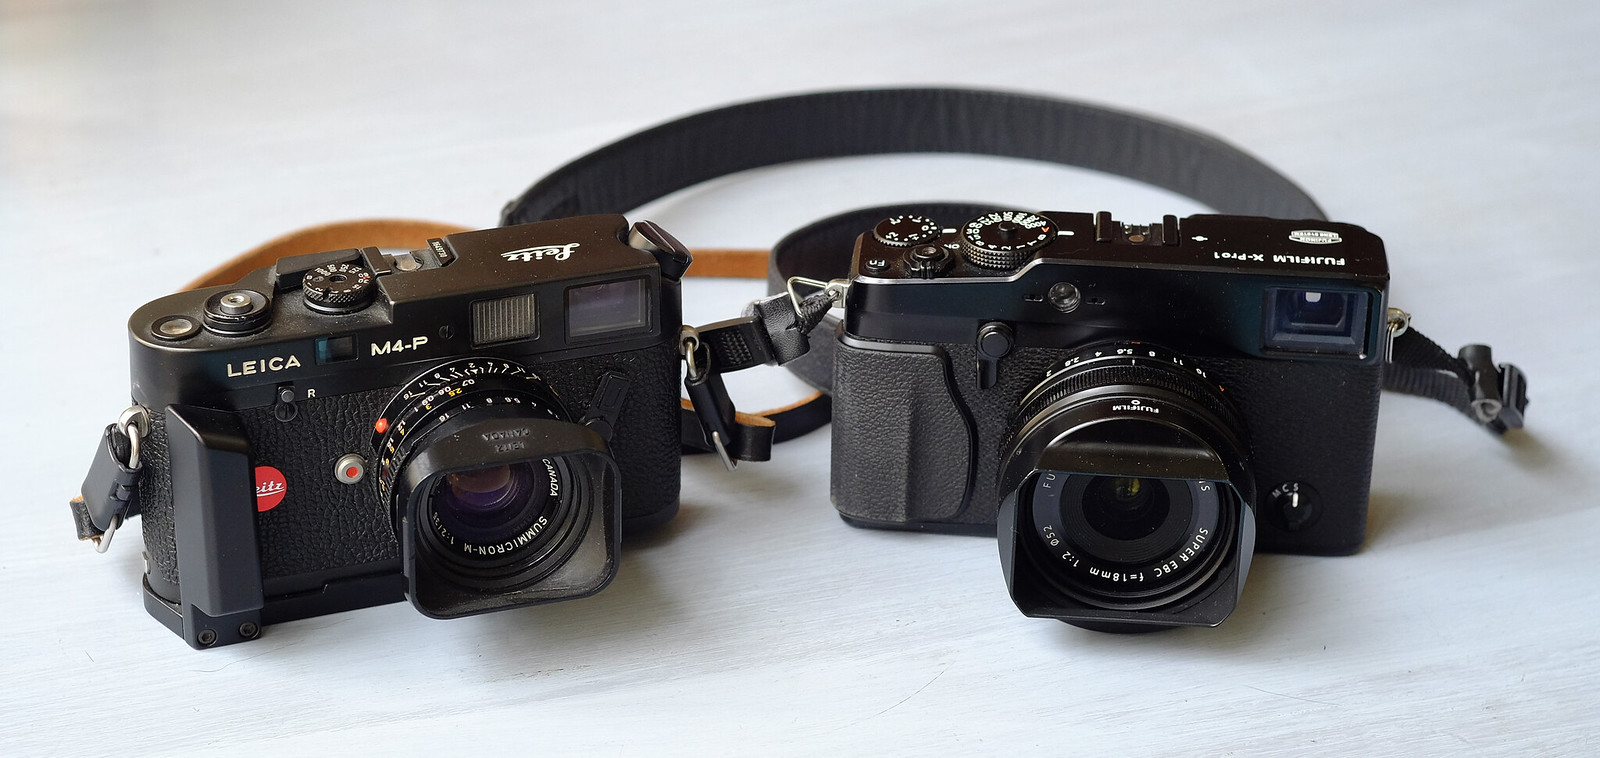 Leica M4-P vs Fuji X-PRO1 | Philippe Burzock | Flickr